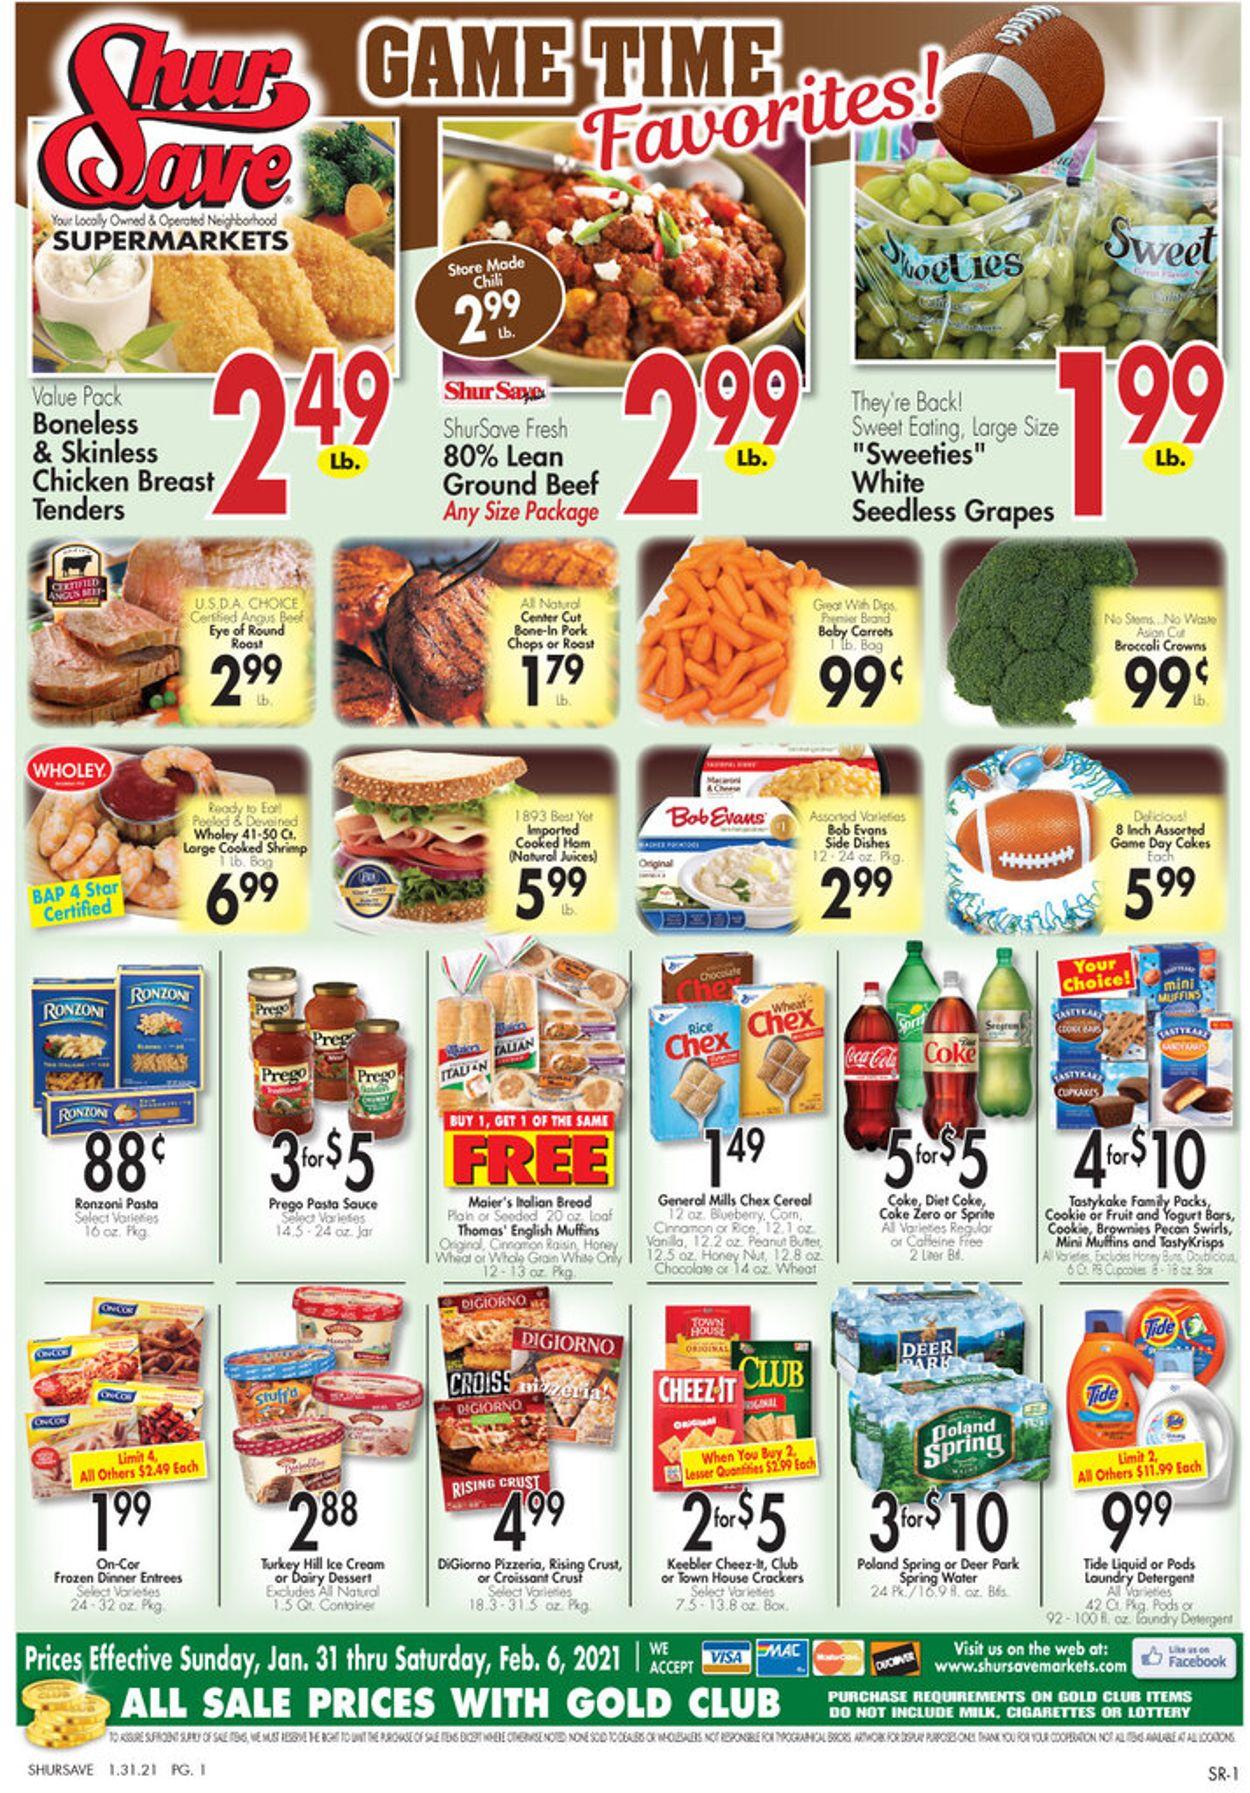 Gerrity's Supermarkets Weekly Ad Circular - valid 01/31-02/06/2021